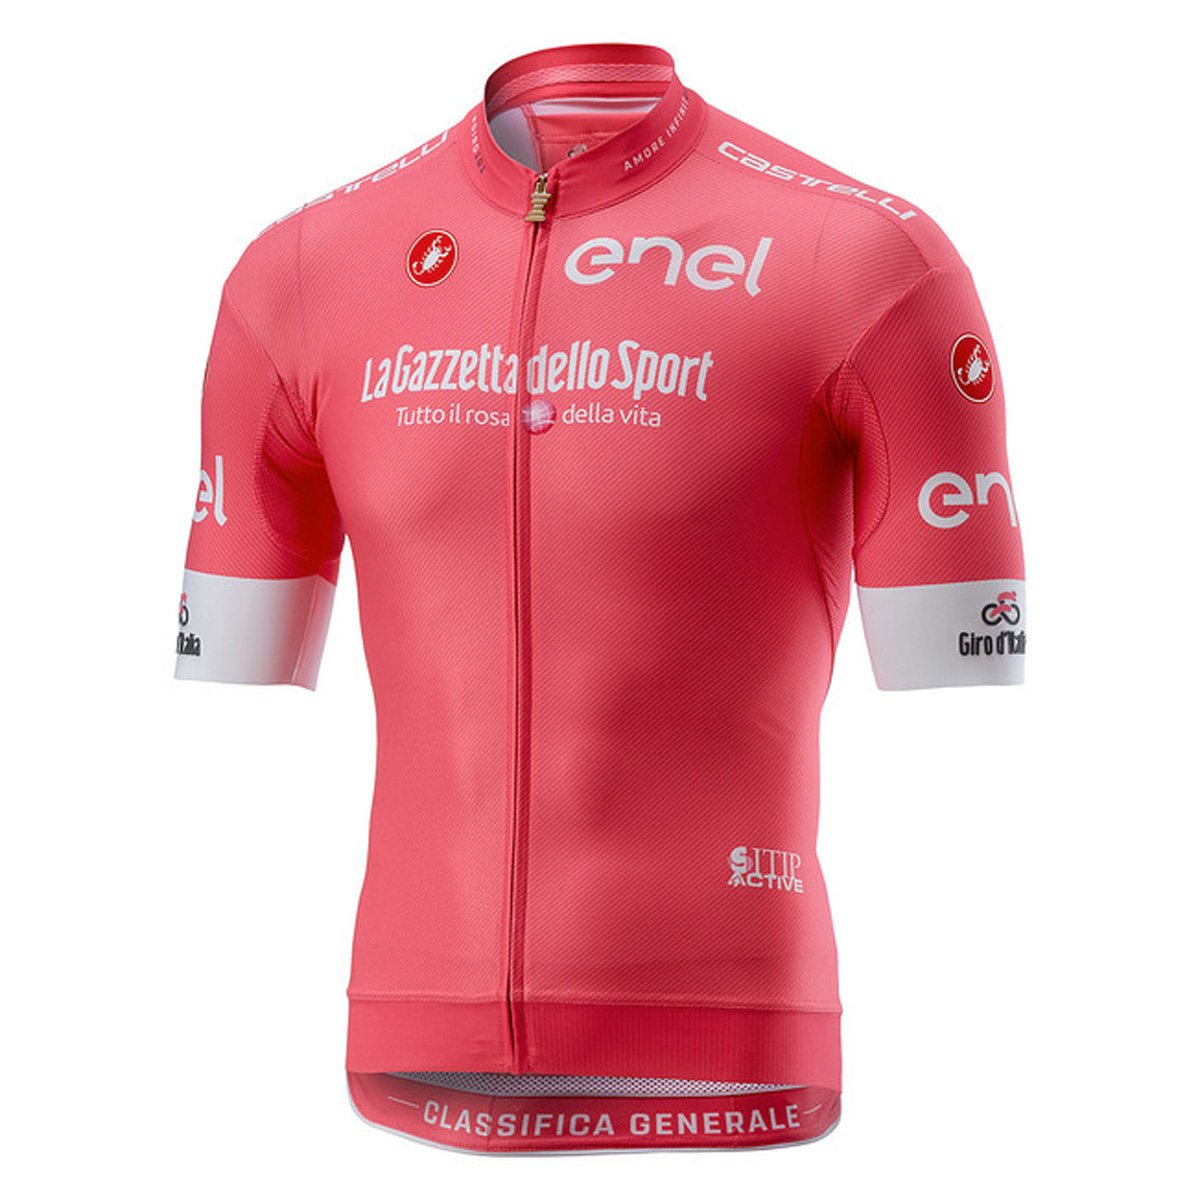 Castelli Giro RaceフルジップJersey – Men 's B07CVNRPZR  Rosa Giro Large